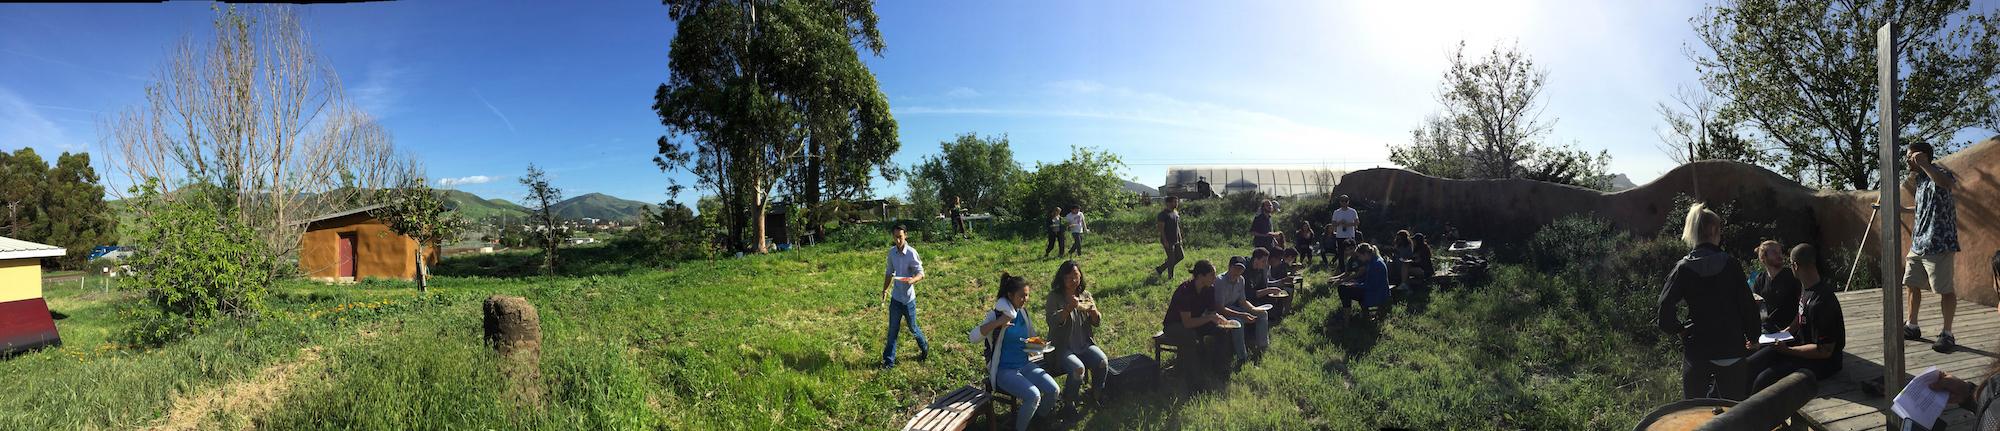 calpoly Student Experimental Farm